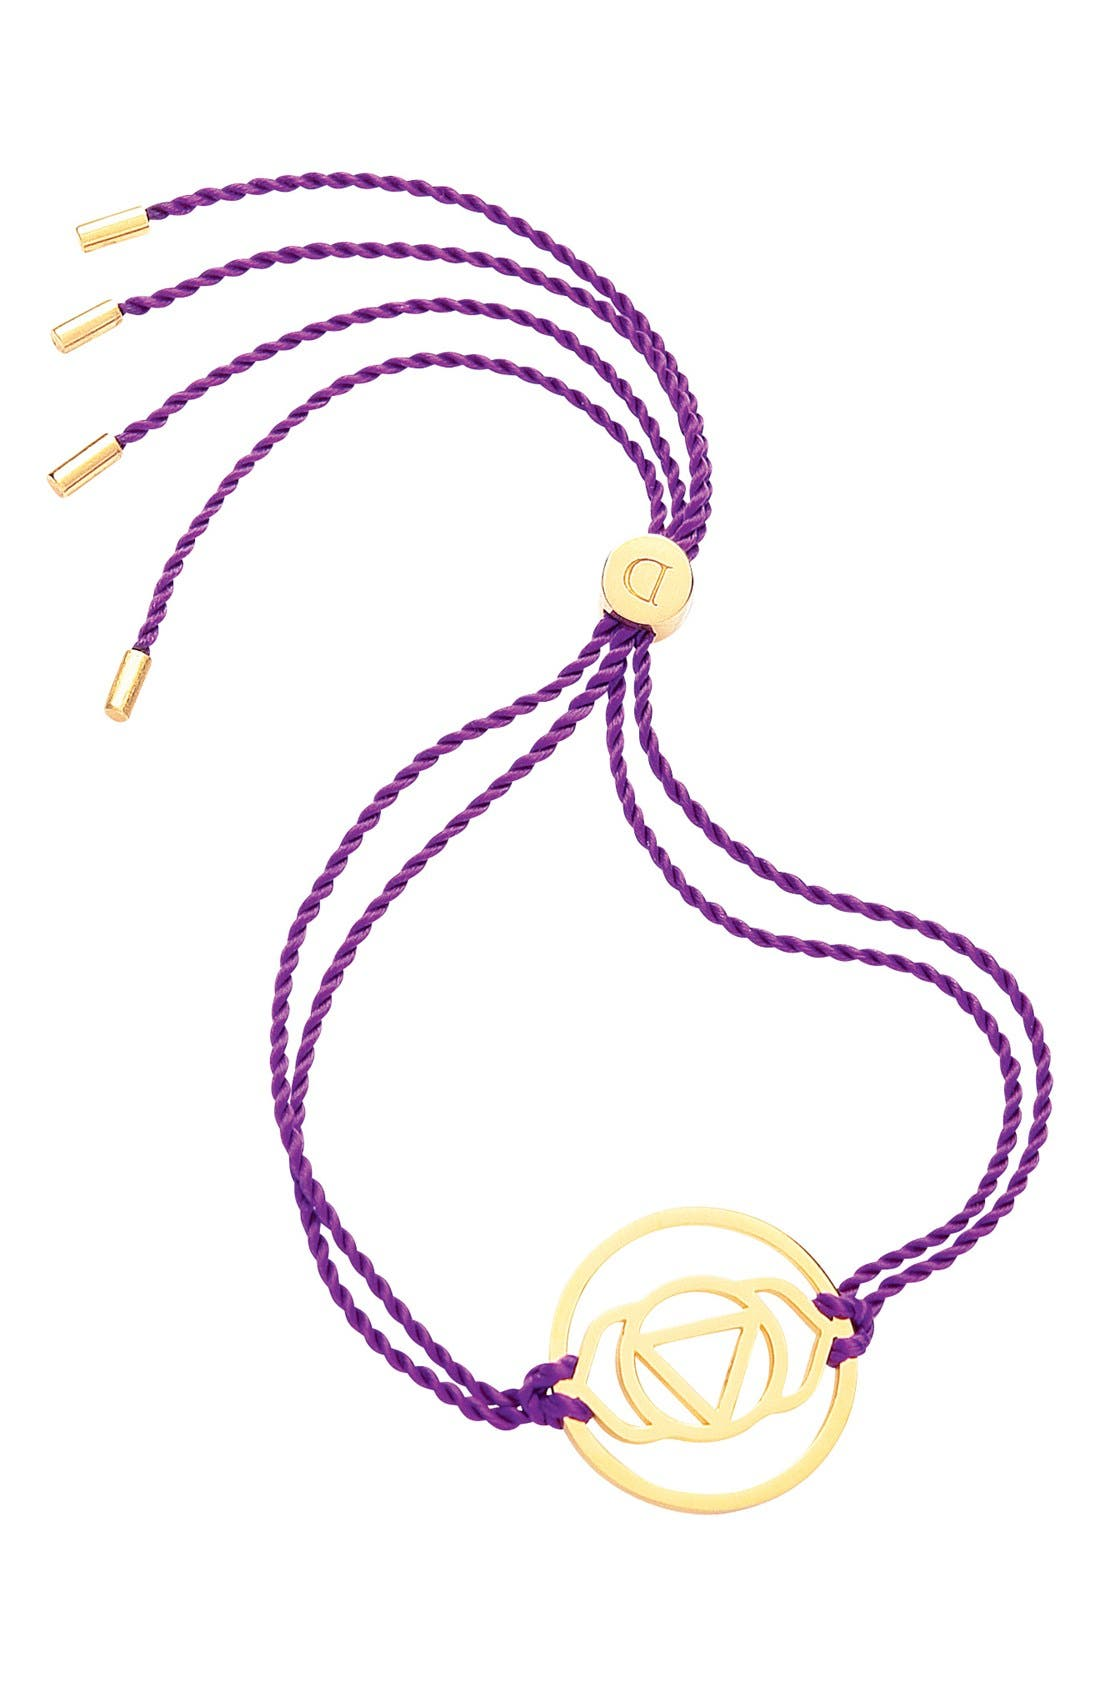 'Brow Chakra' Cord Bracelet,                             Main thumbnail 1, color,                             500